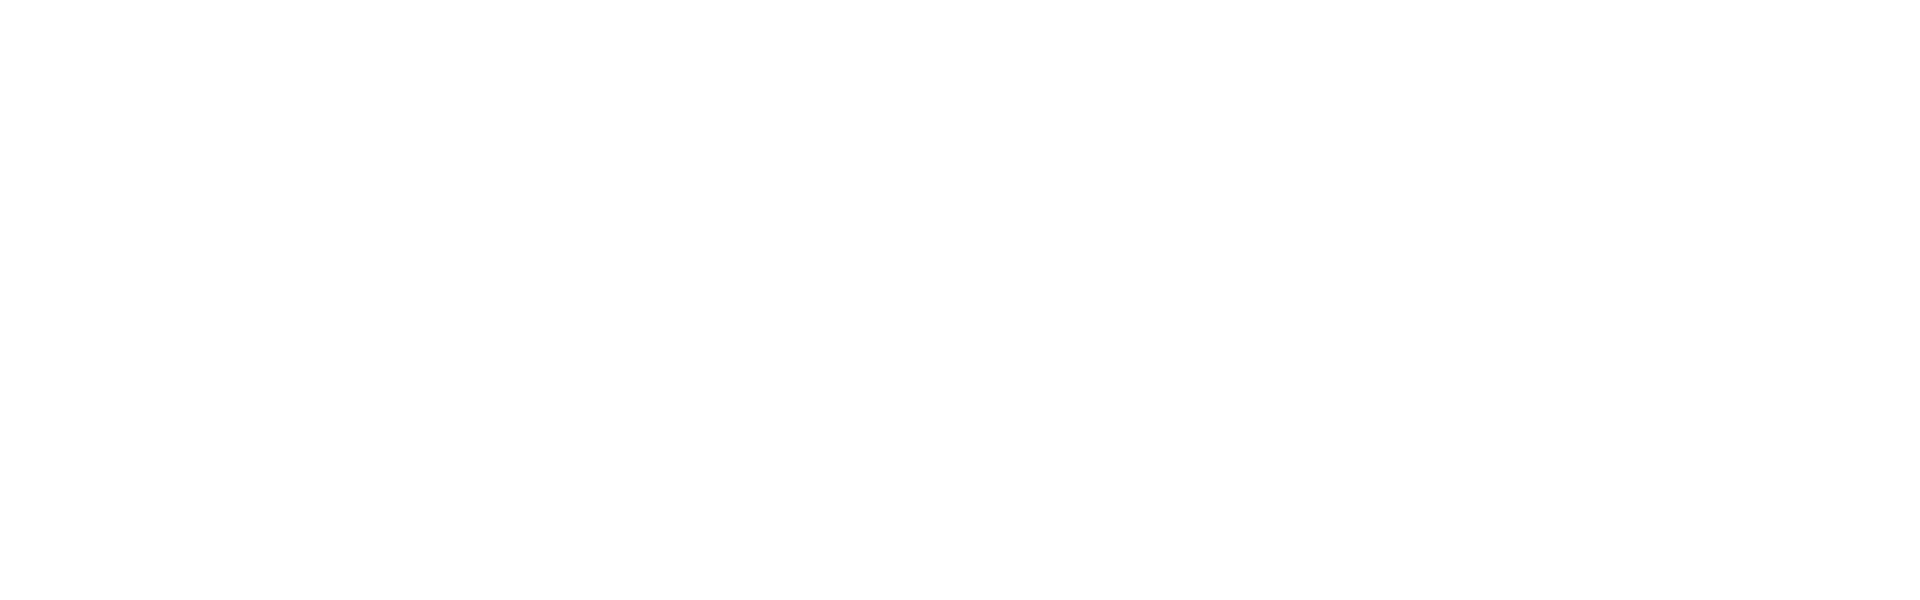 LifeBanner.png